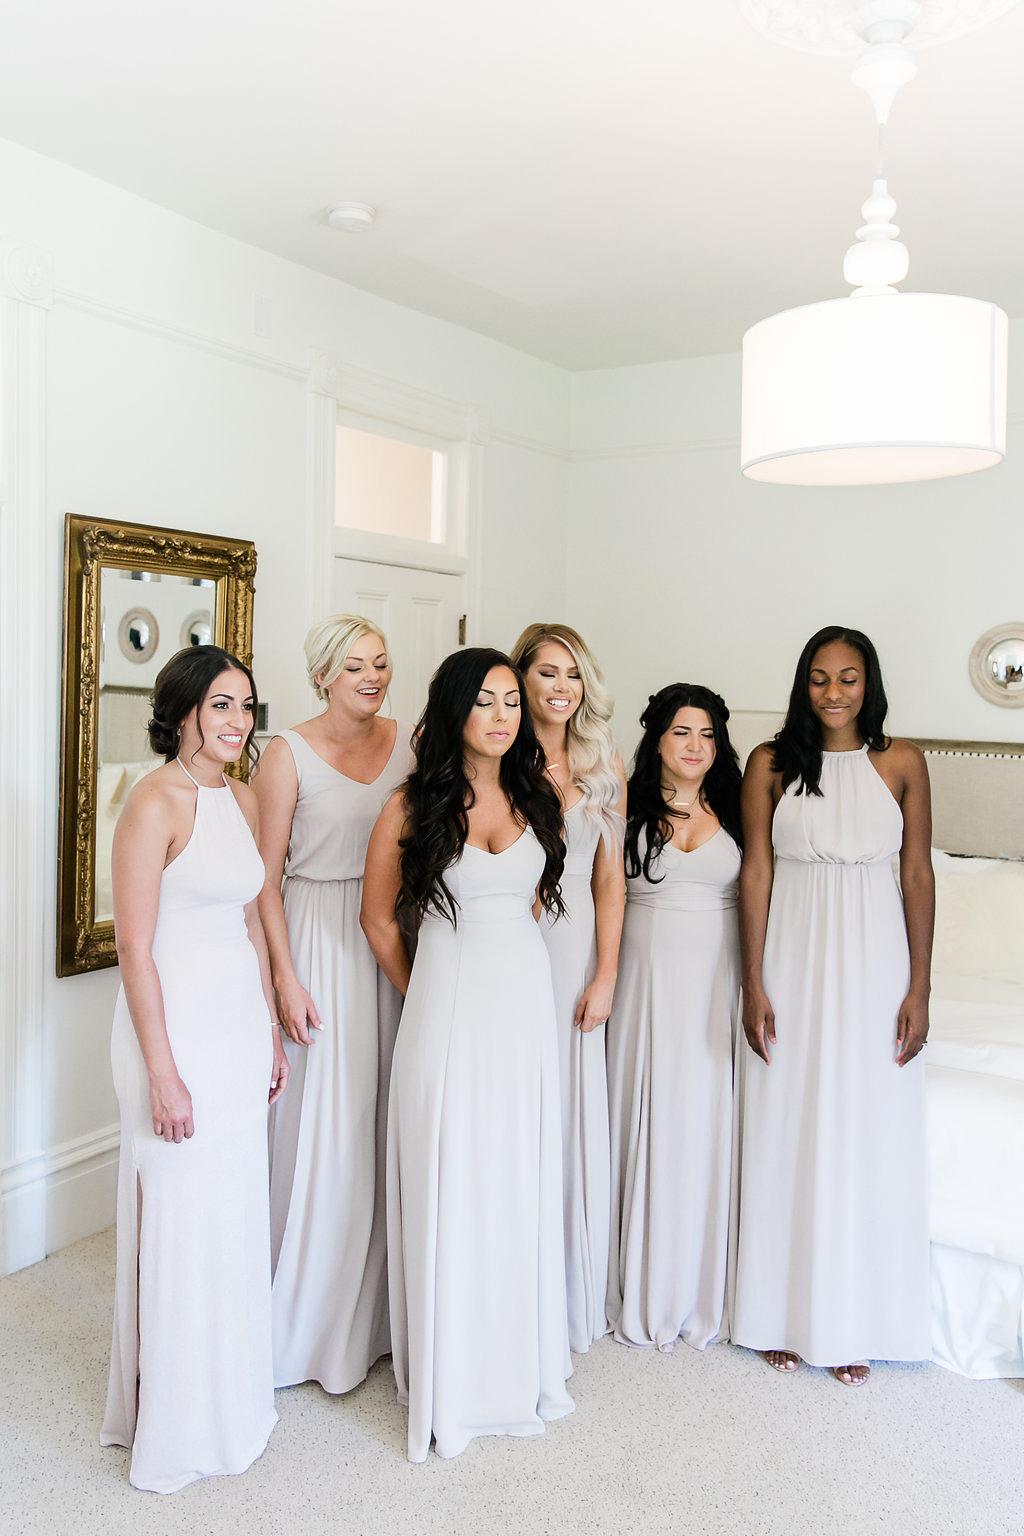 Park Winters Wedding | Bridesmaids First Look | Nude Bridesmaids Dress